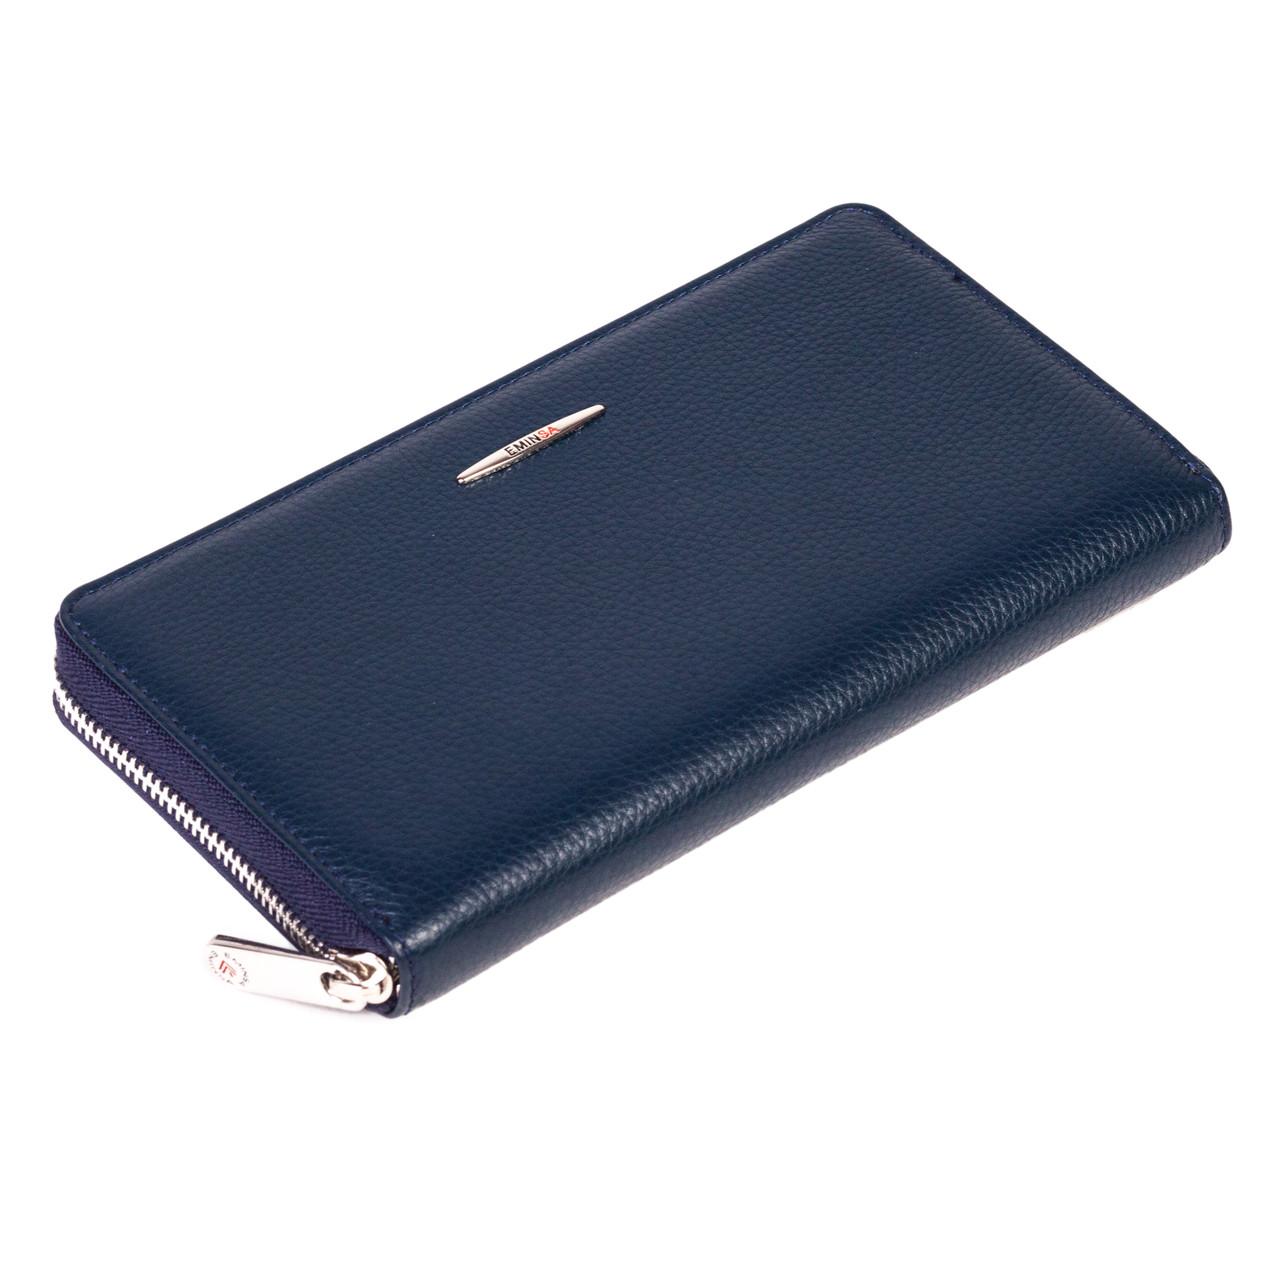 Женский кошелек Eminsa 2152-18-19 кожаный синий